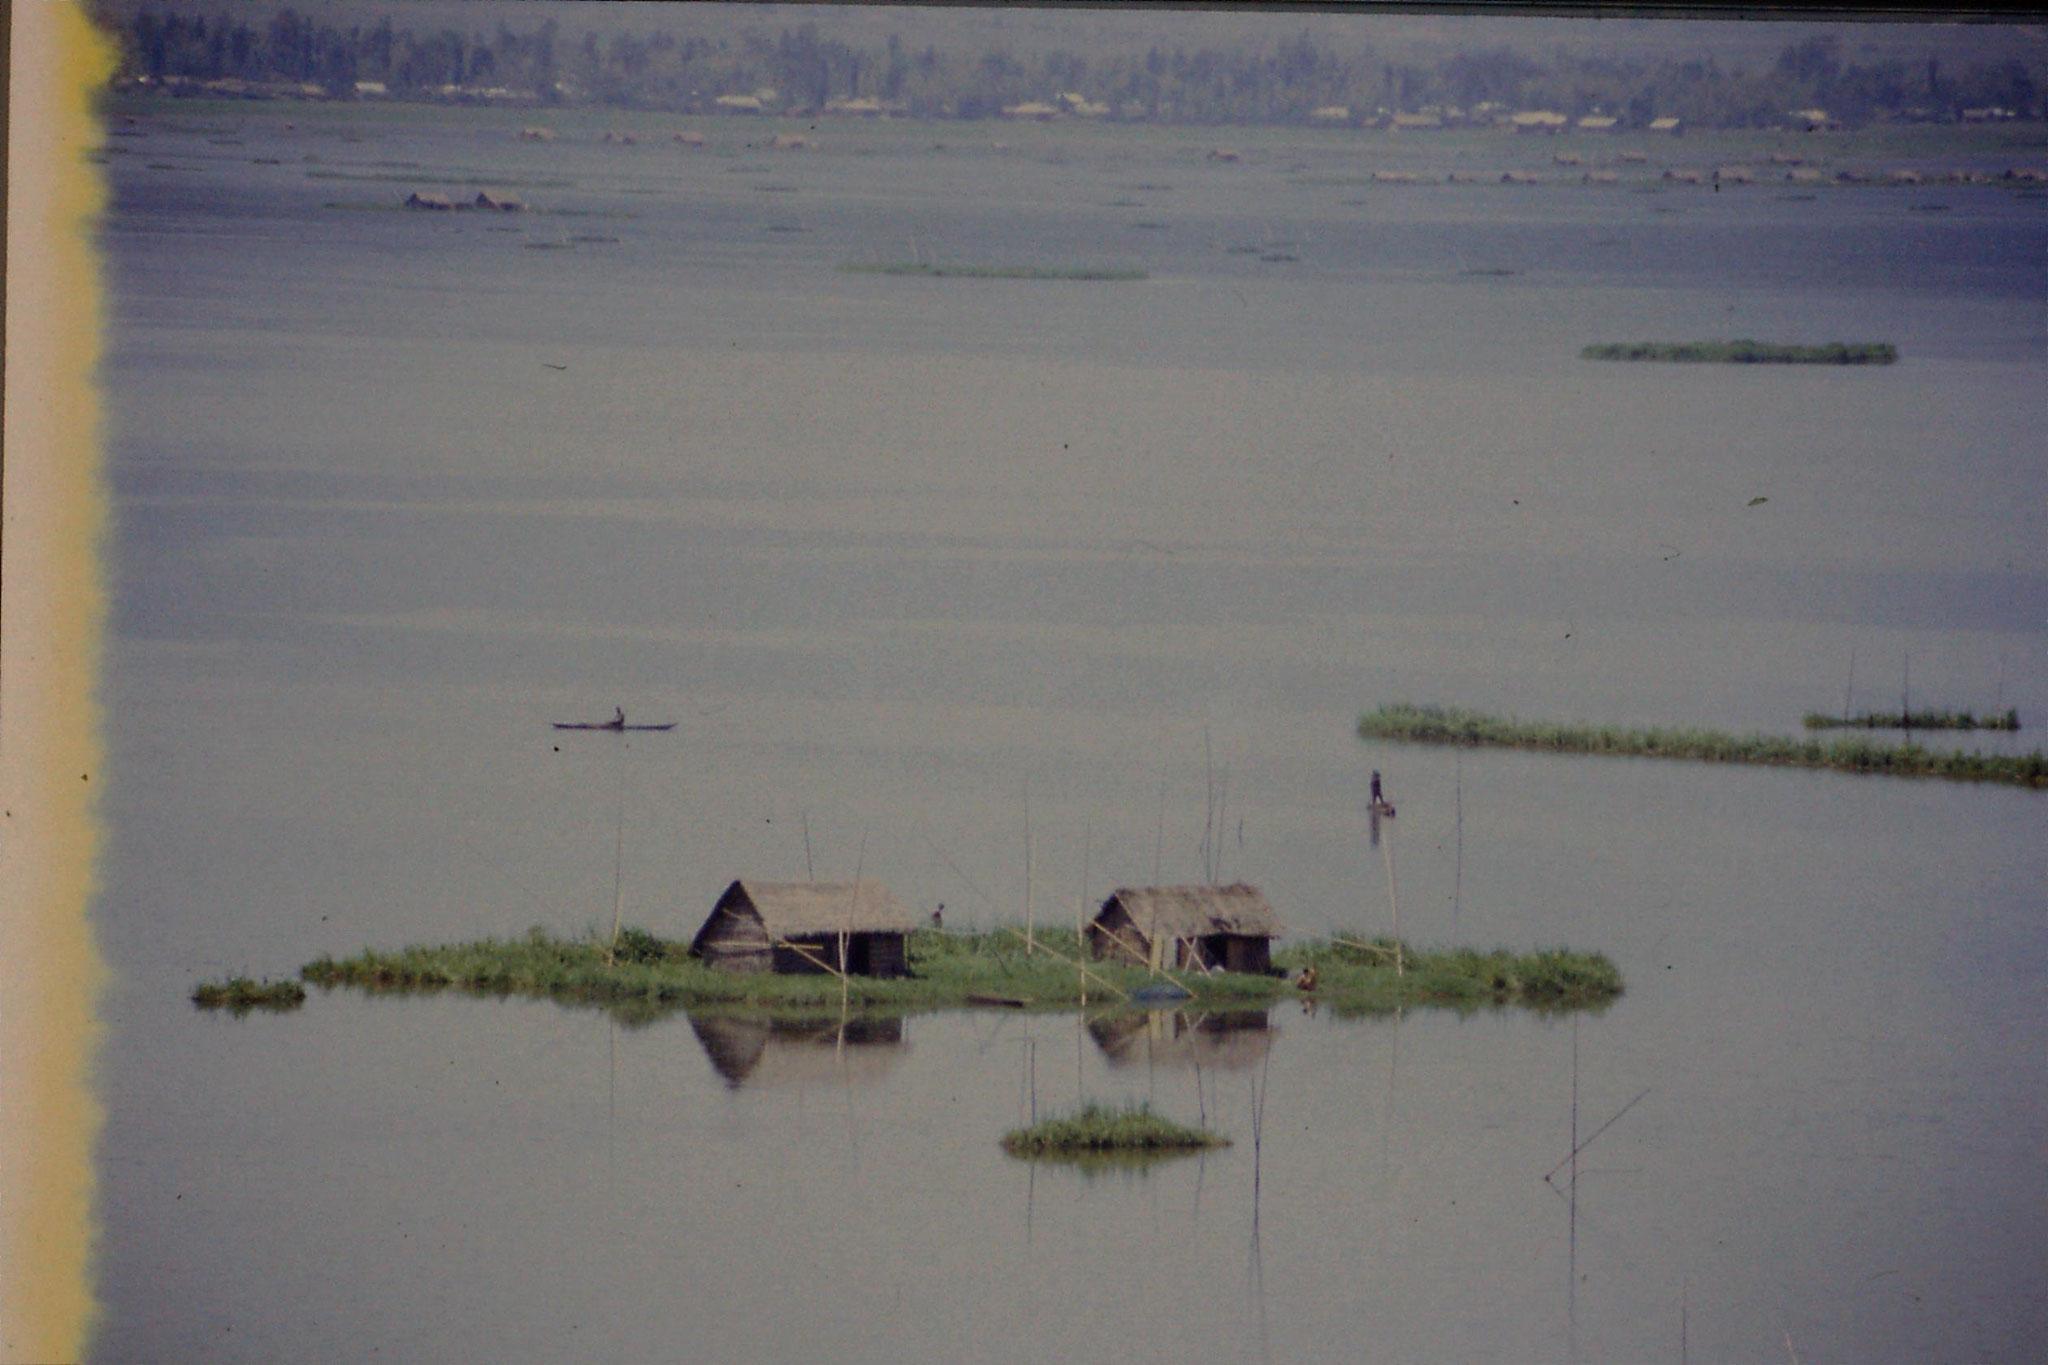 113/17: 17/4 Lok Tak - islands